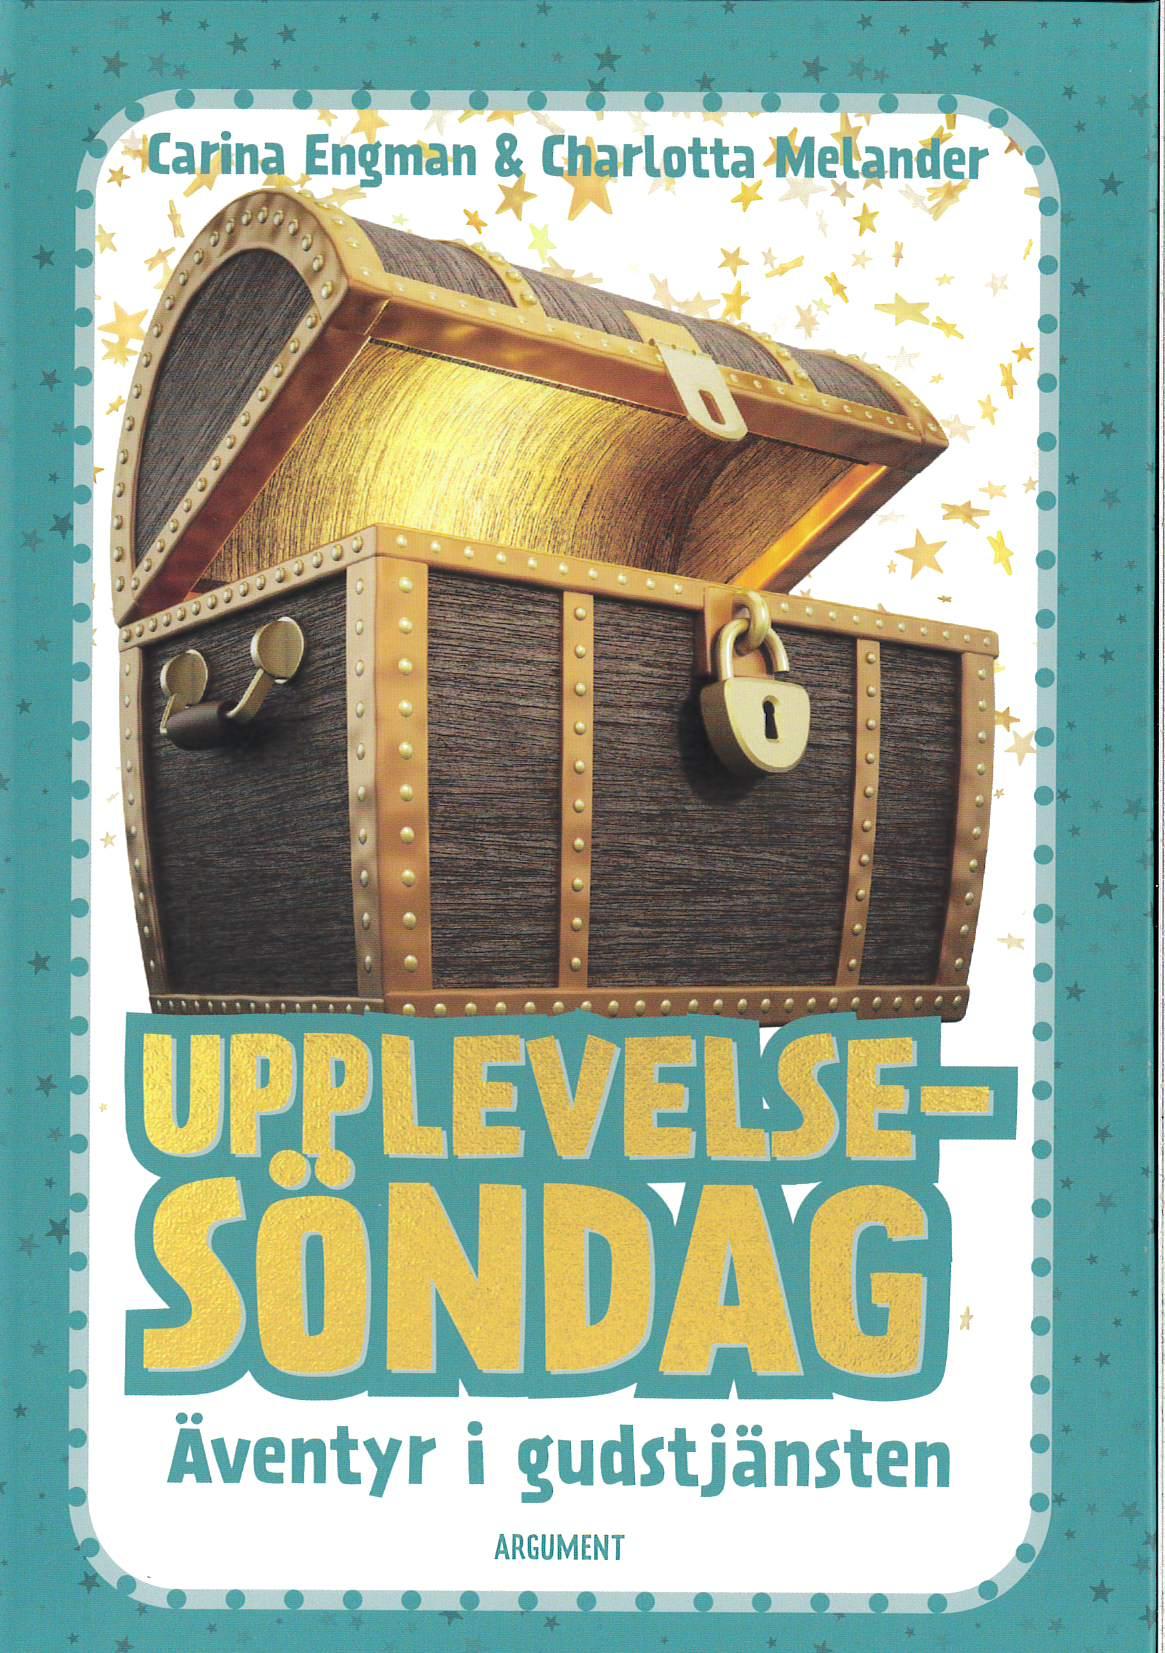 Upplevelsesöndag artikelnummer 2587 via bibelbutiken.se